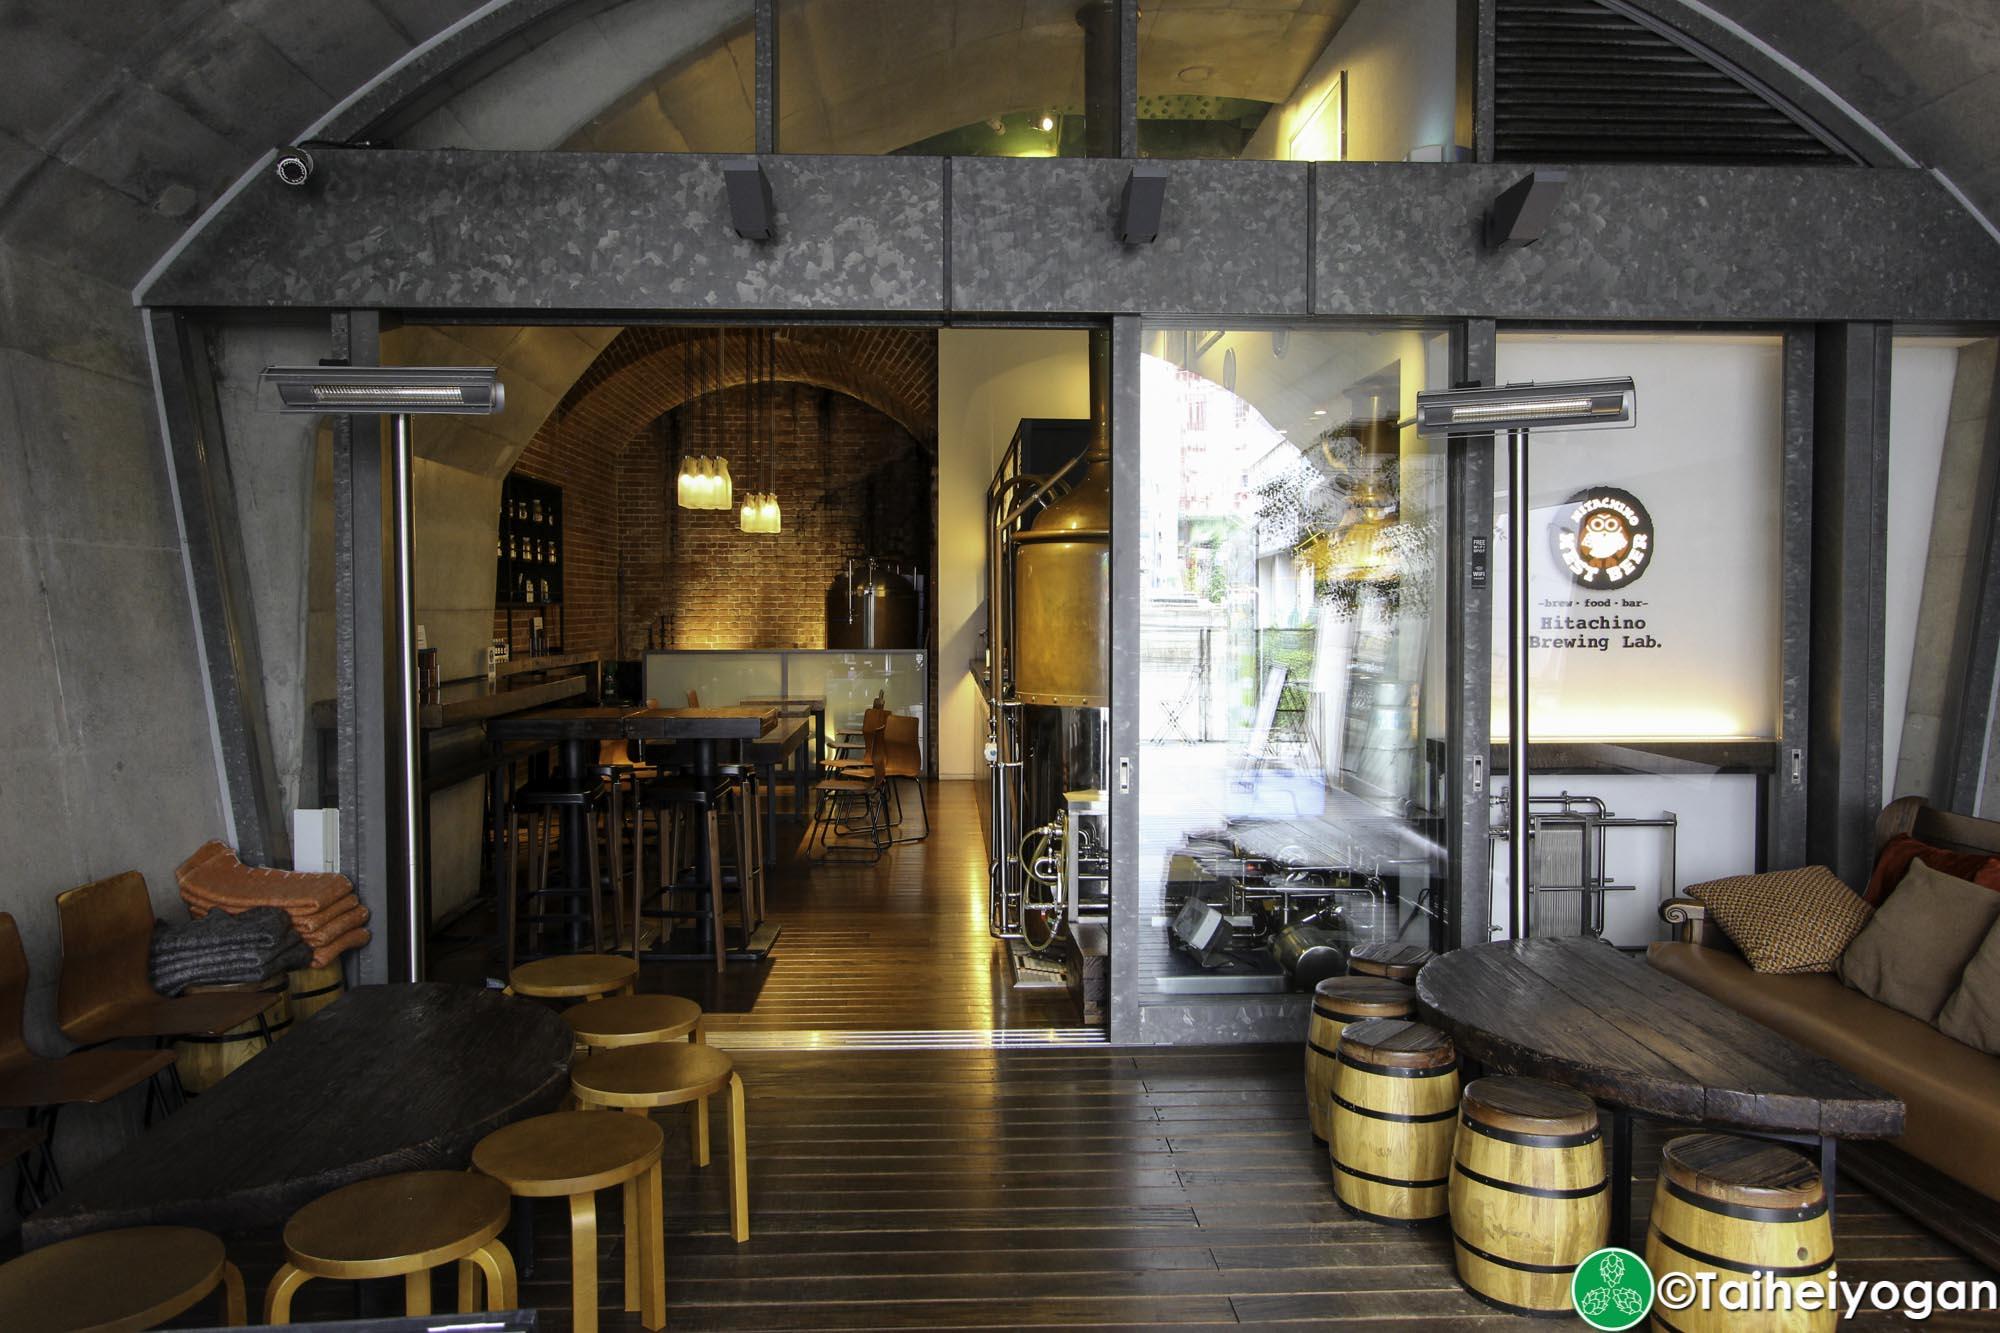 Hitachino Brewing Lab (Kanda Manseibashi - Akihabara)